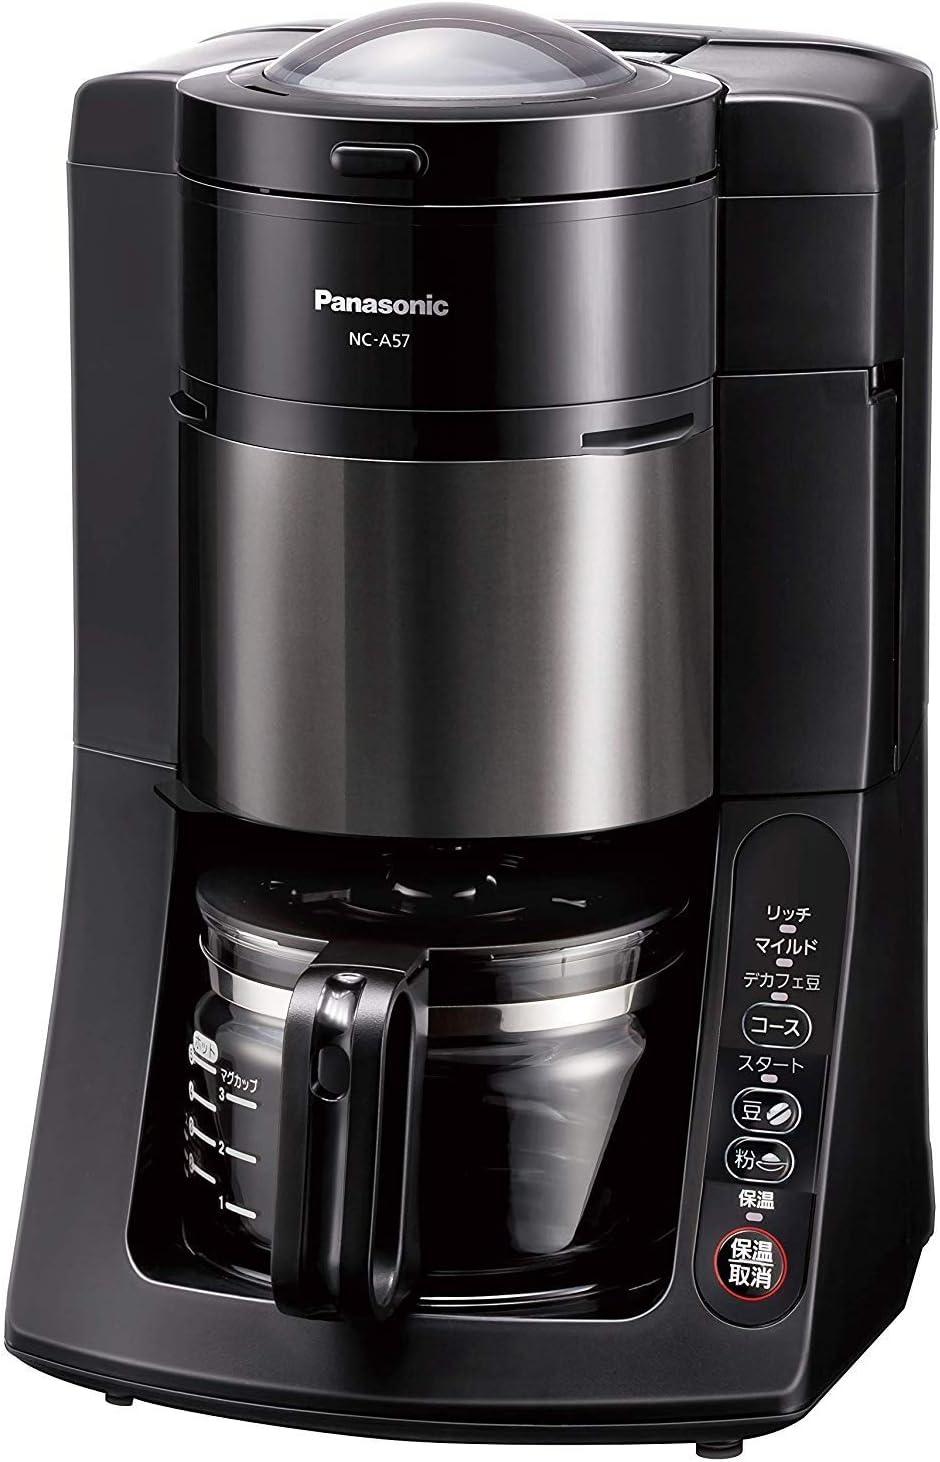 Panasonic(パナソニック)沸騰浄水コーヒーメーカー